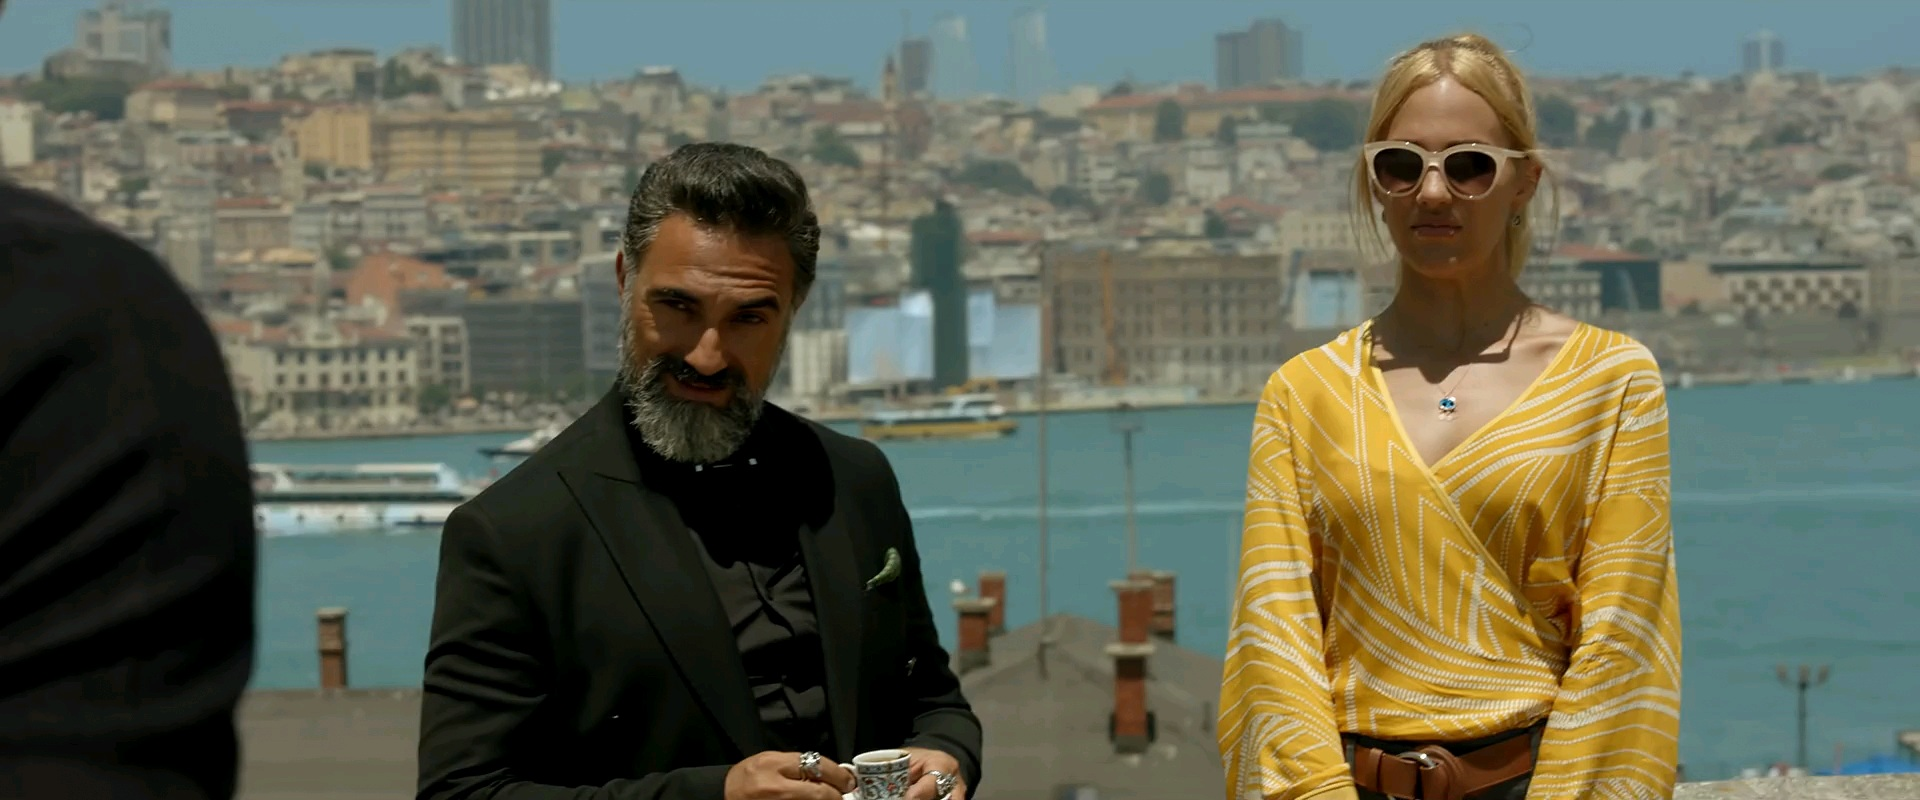 Cingöz Recai | 2017 | Yerli Film | NF | WEB-DL | XviD | Sansürsüz | 1080p - m720p - m1080p | WEB-DL | Tek Link